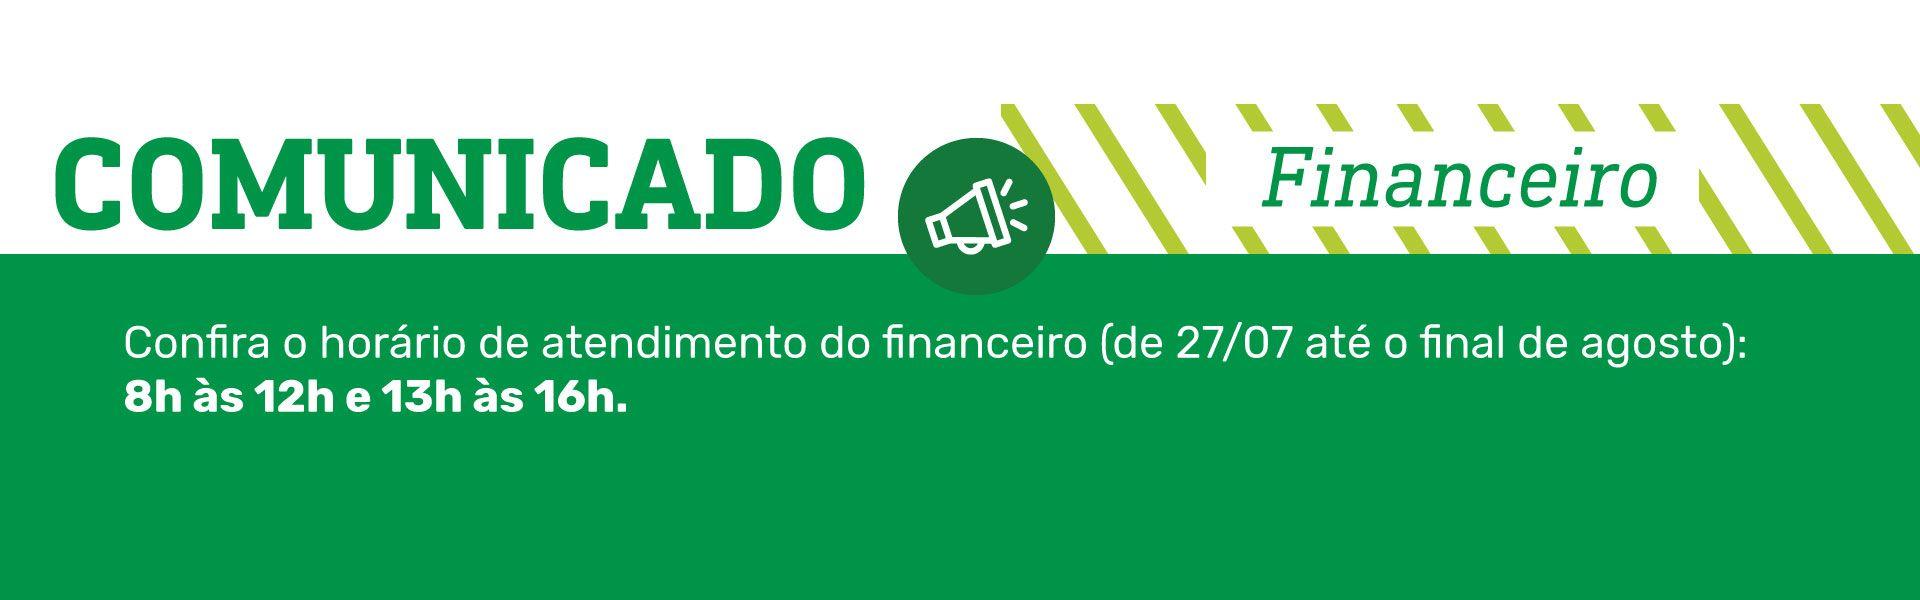 aviso financeiro